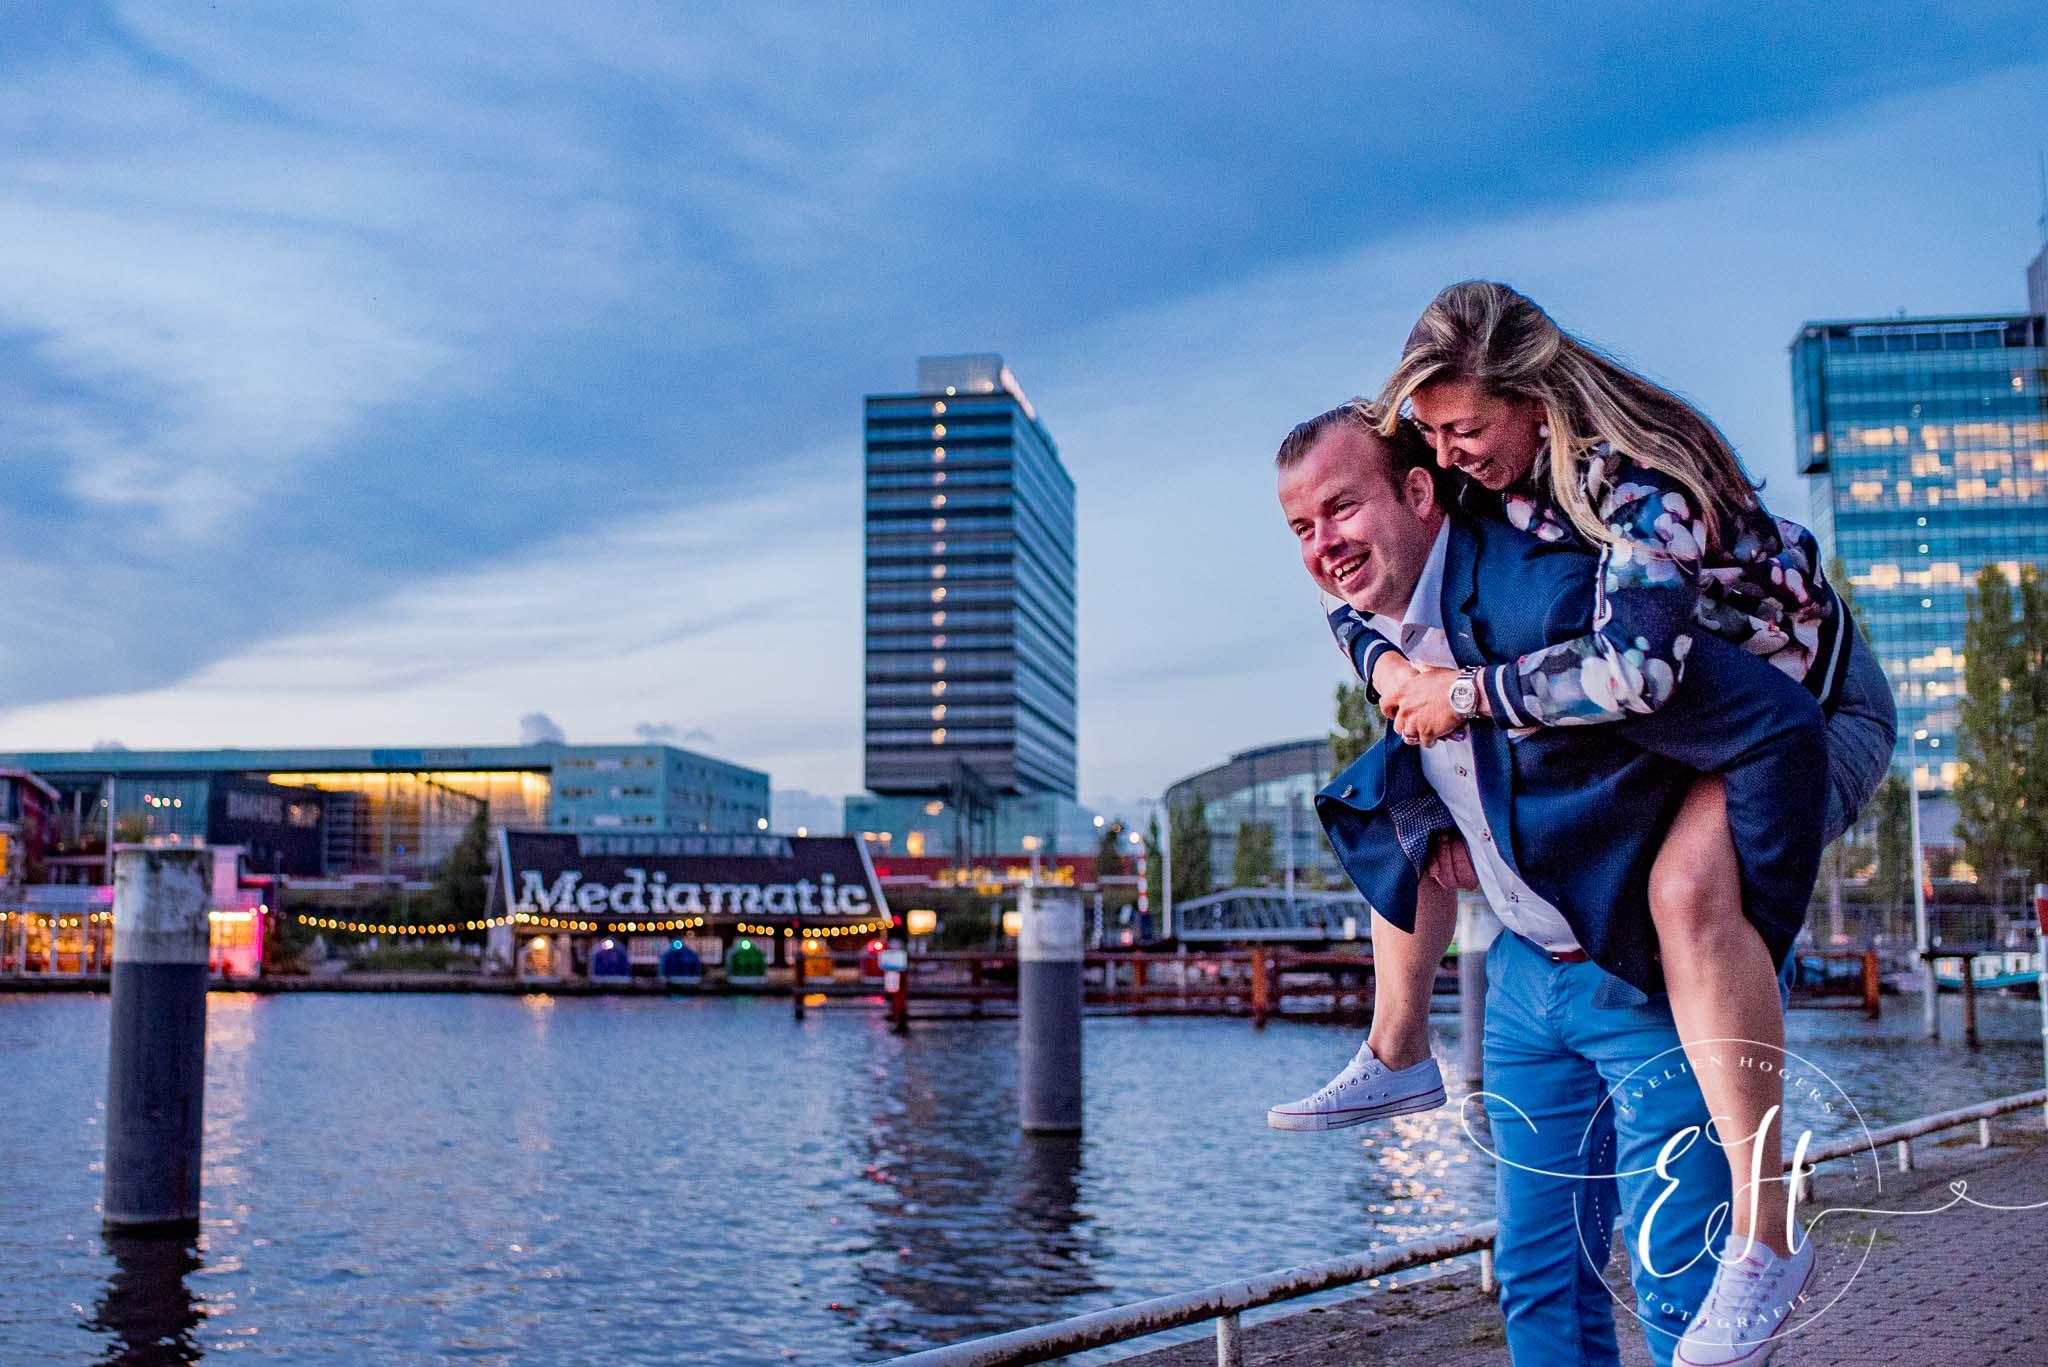 loveshoot-in-amsterdam-evelien-hogers-fotografie (21 van 26).jpg